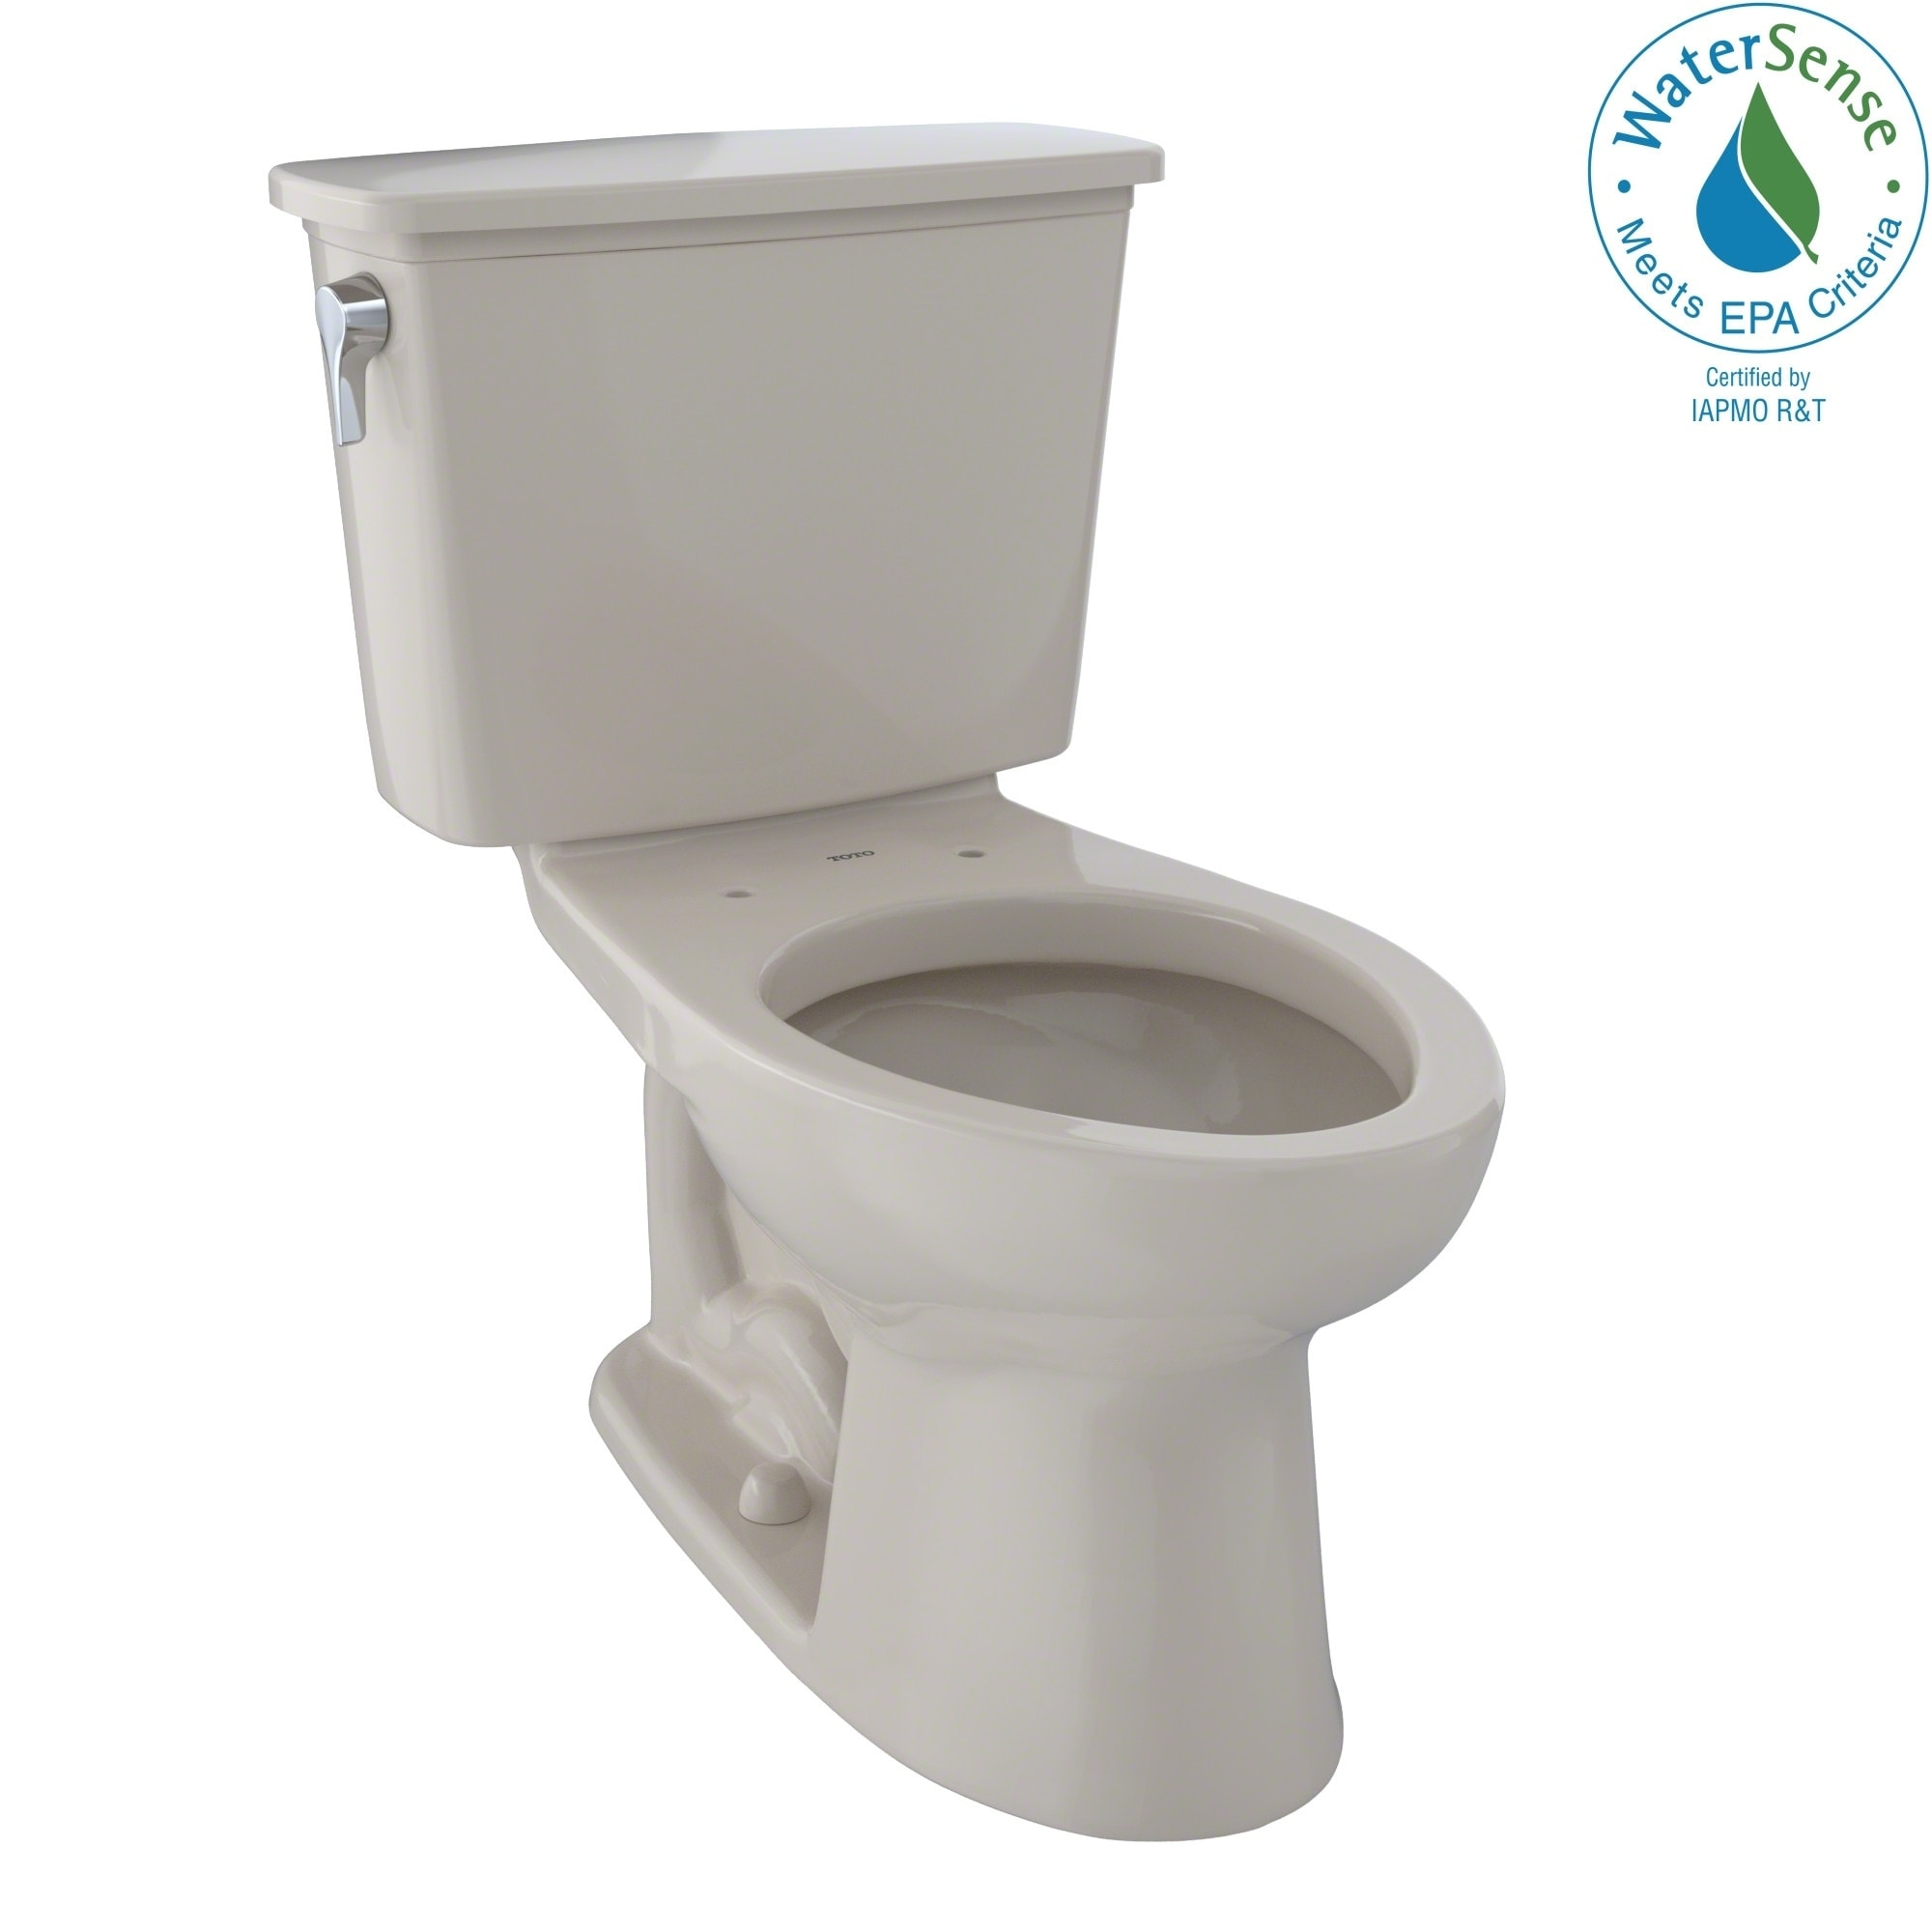 Toto Eco-drake Ada Elongated Bowl Toilet Bone (Bone), Bei...